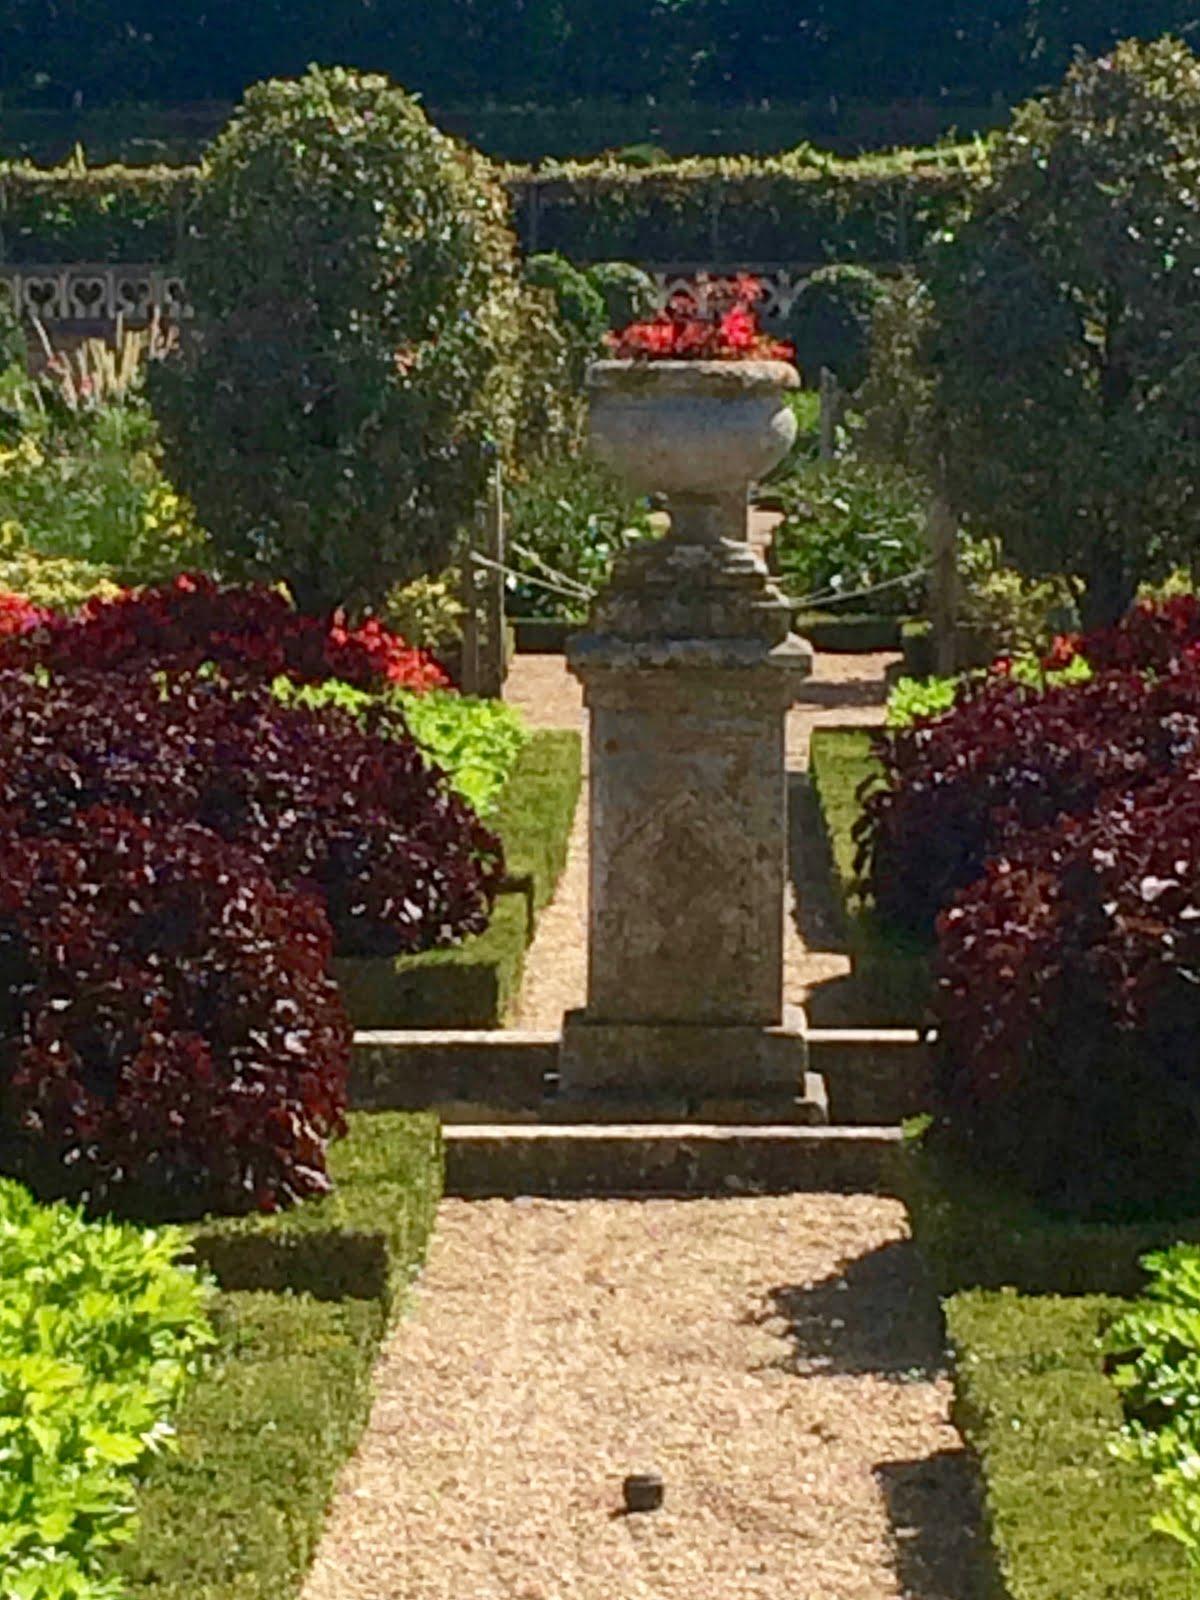 Me and My Green Bin: Royal Botanic Gardens Melbourne